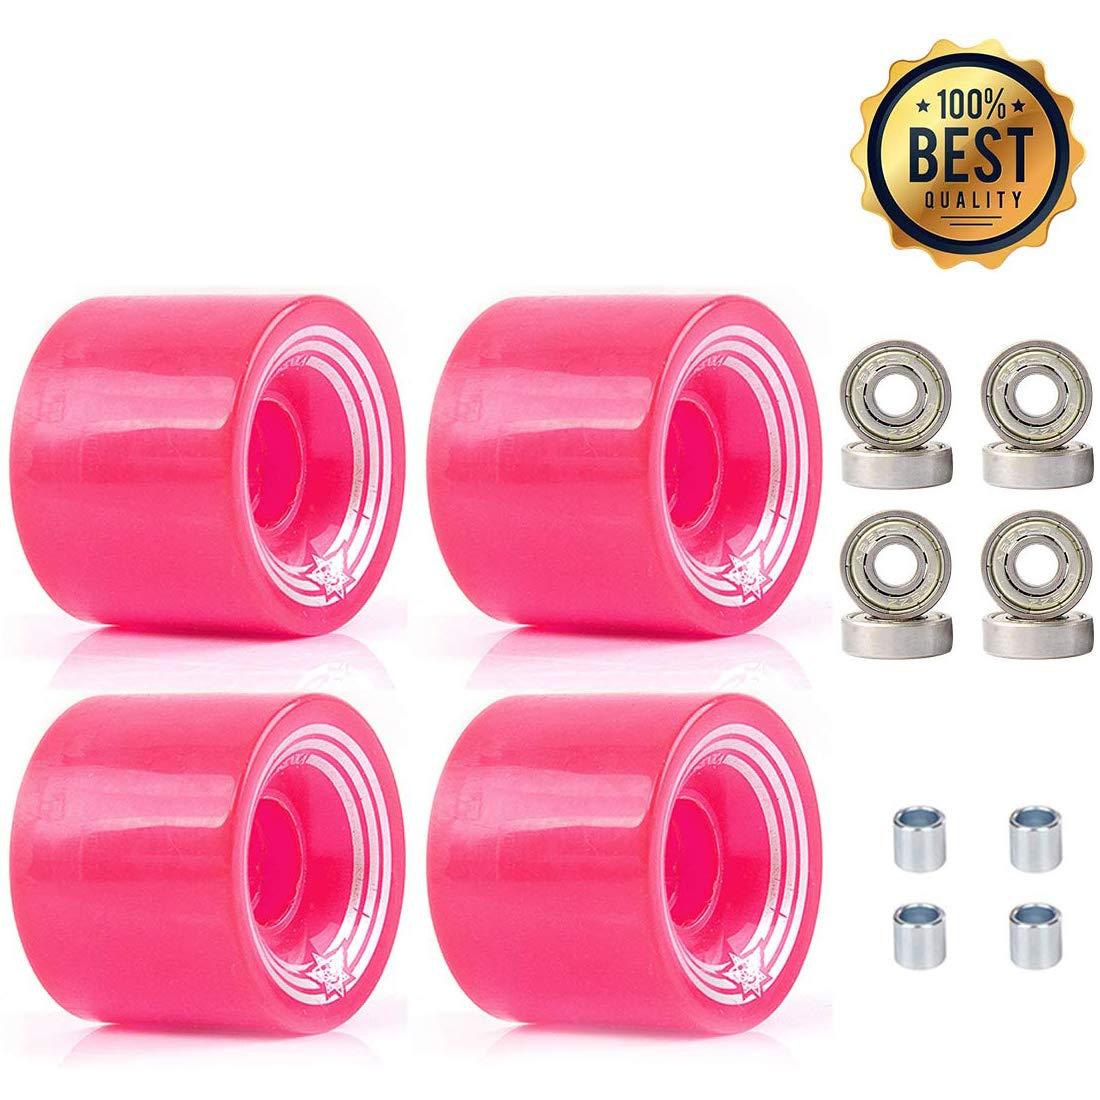 LOSENKA 6045 Fish Skateboard Wheels PU Crusier Skateboard Wheels 4 Pack with Bearing